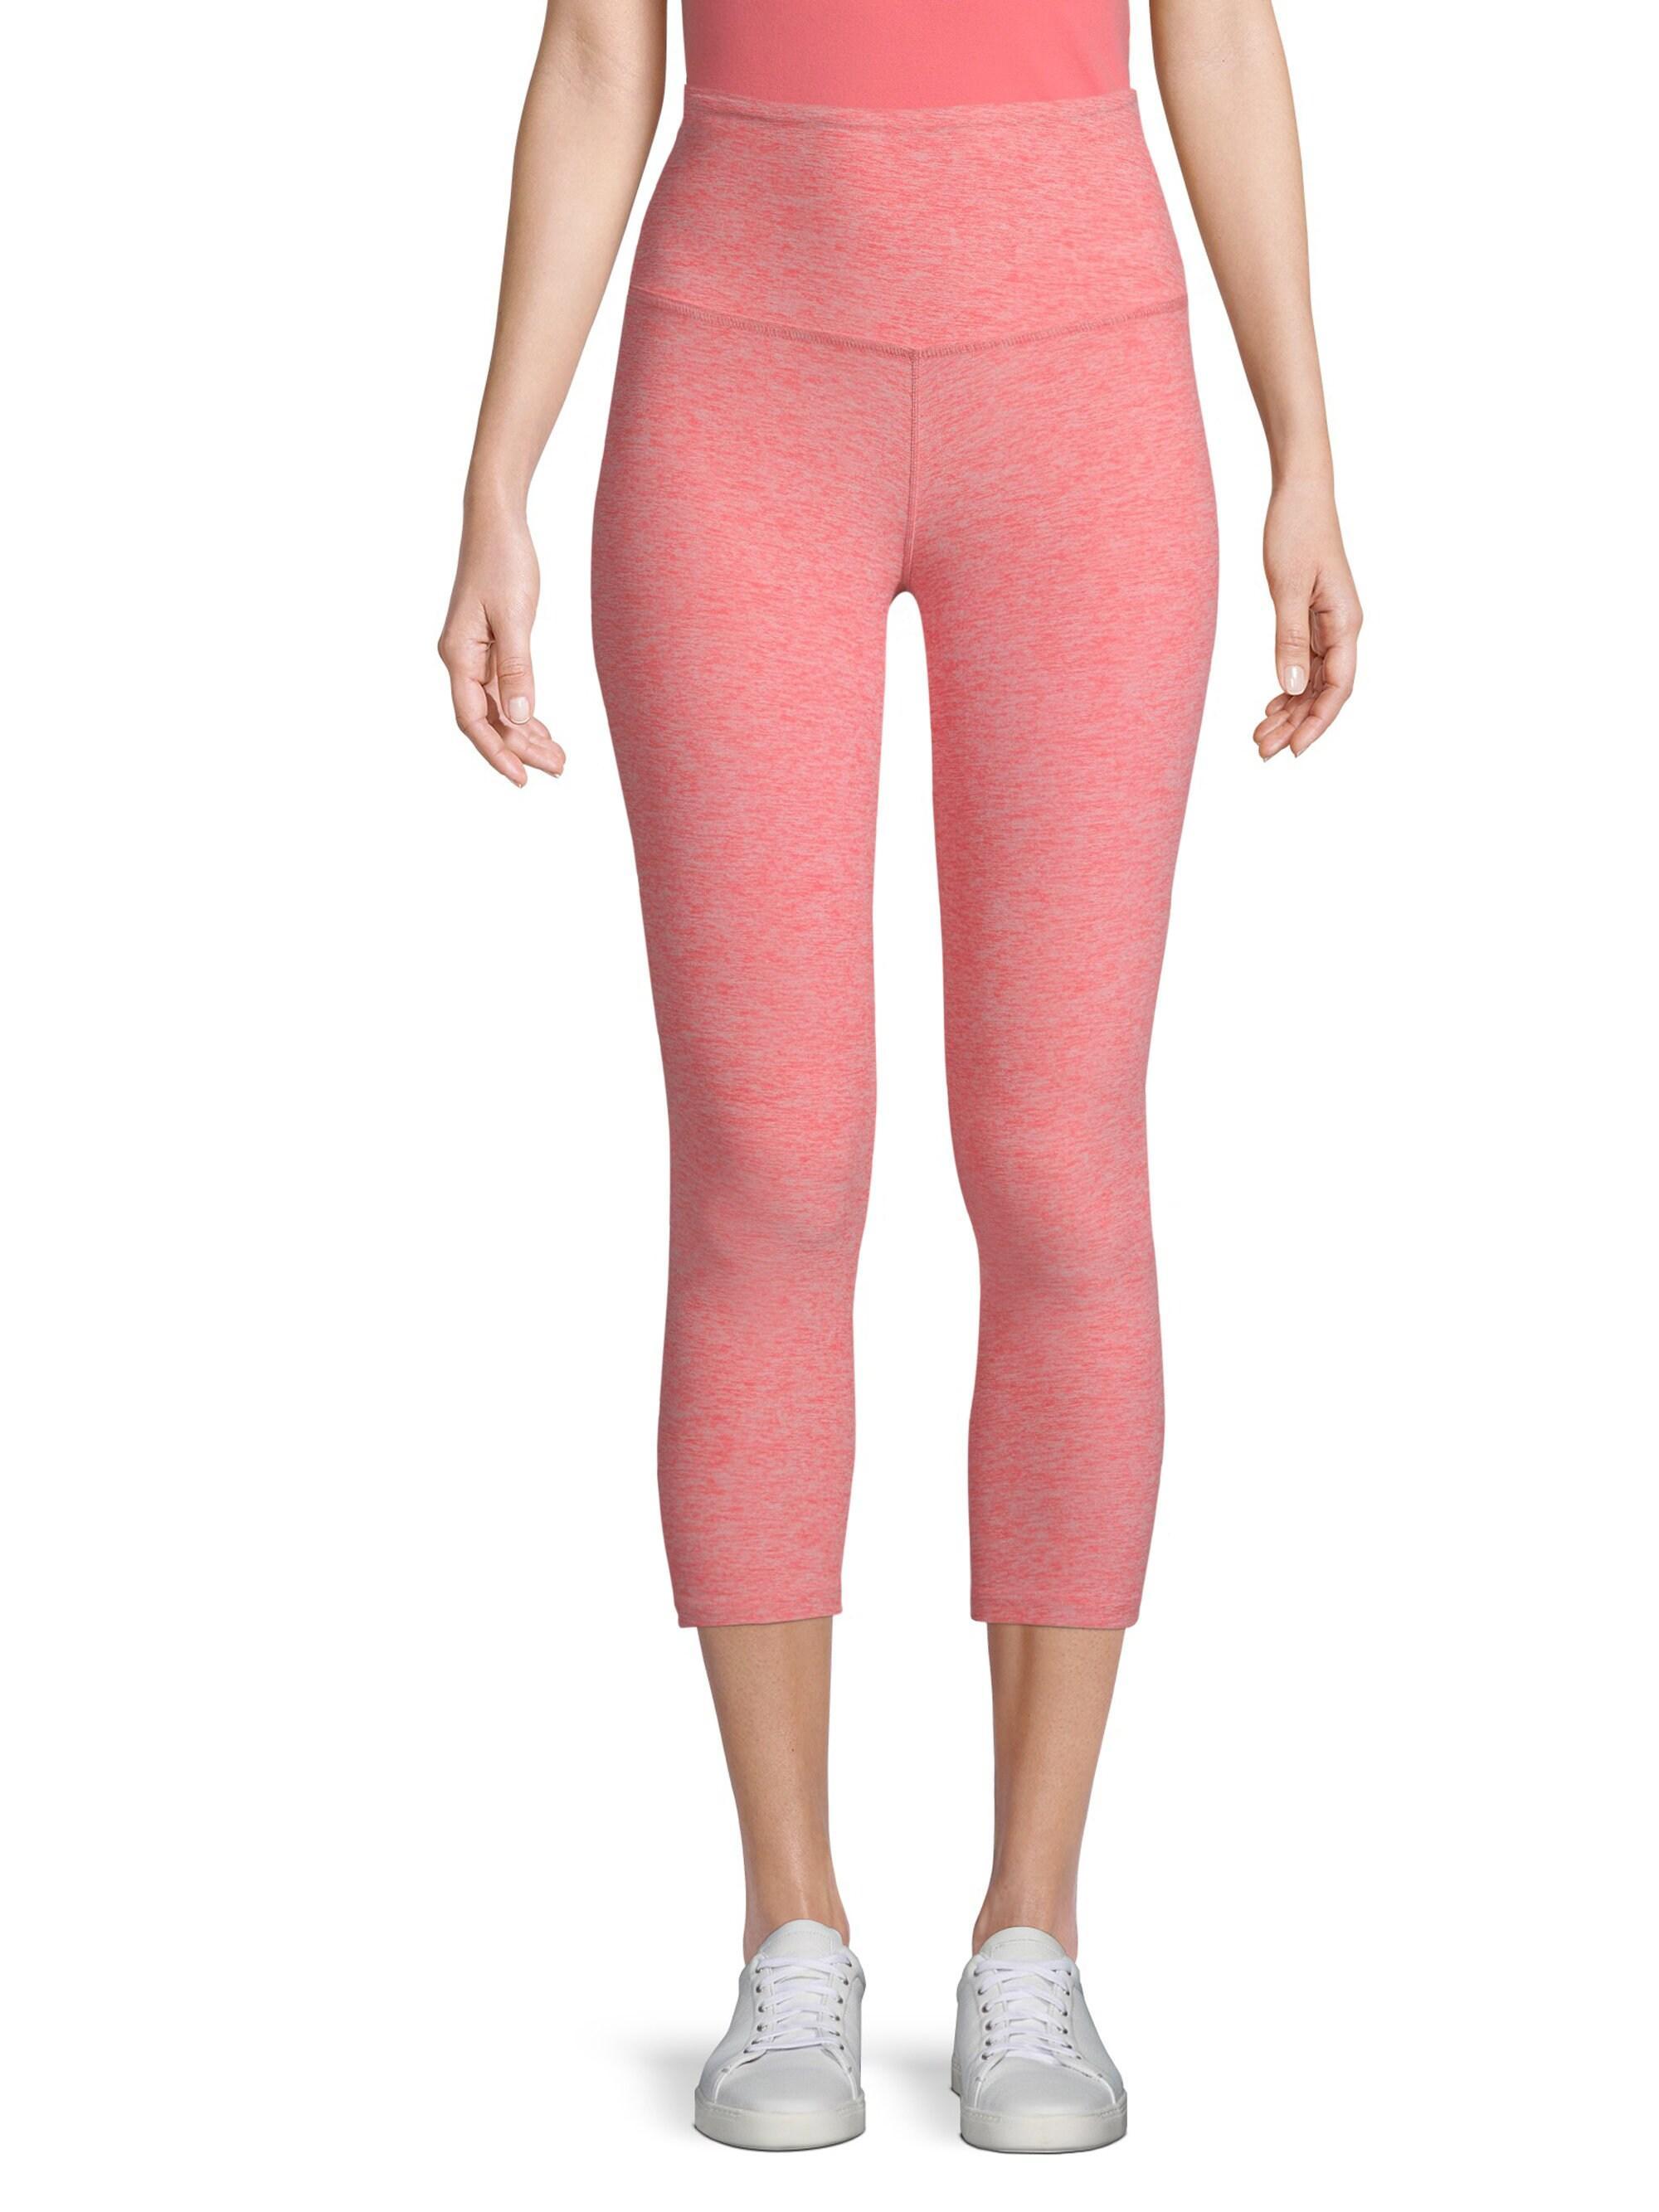 ab2e015803 Beyond Yoga Spacedye Walk And Talk High-waist Capri Leggings in Pink ...